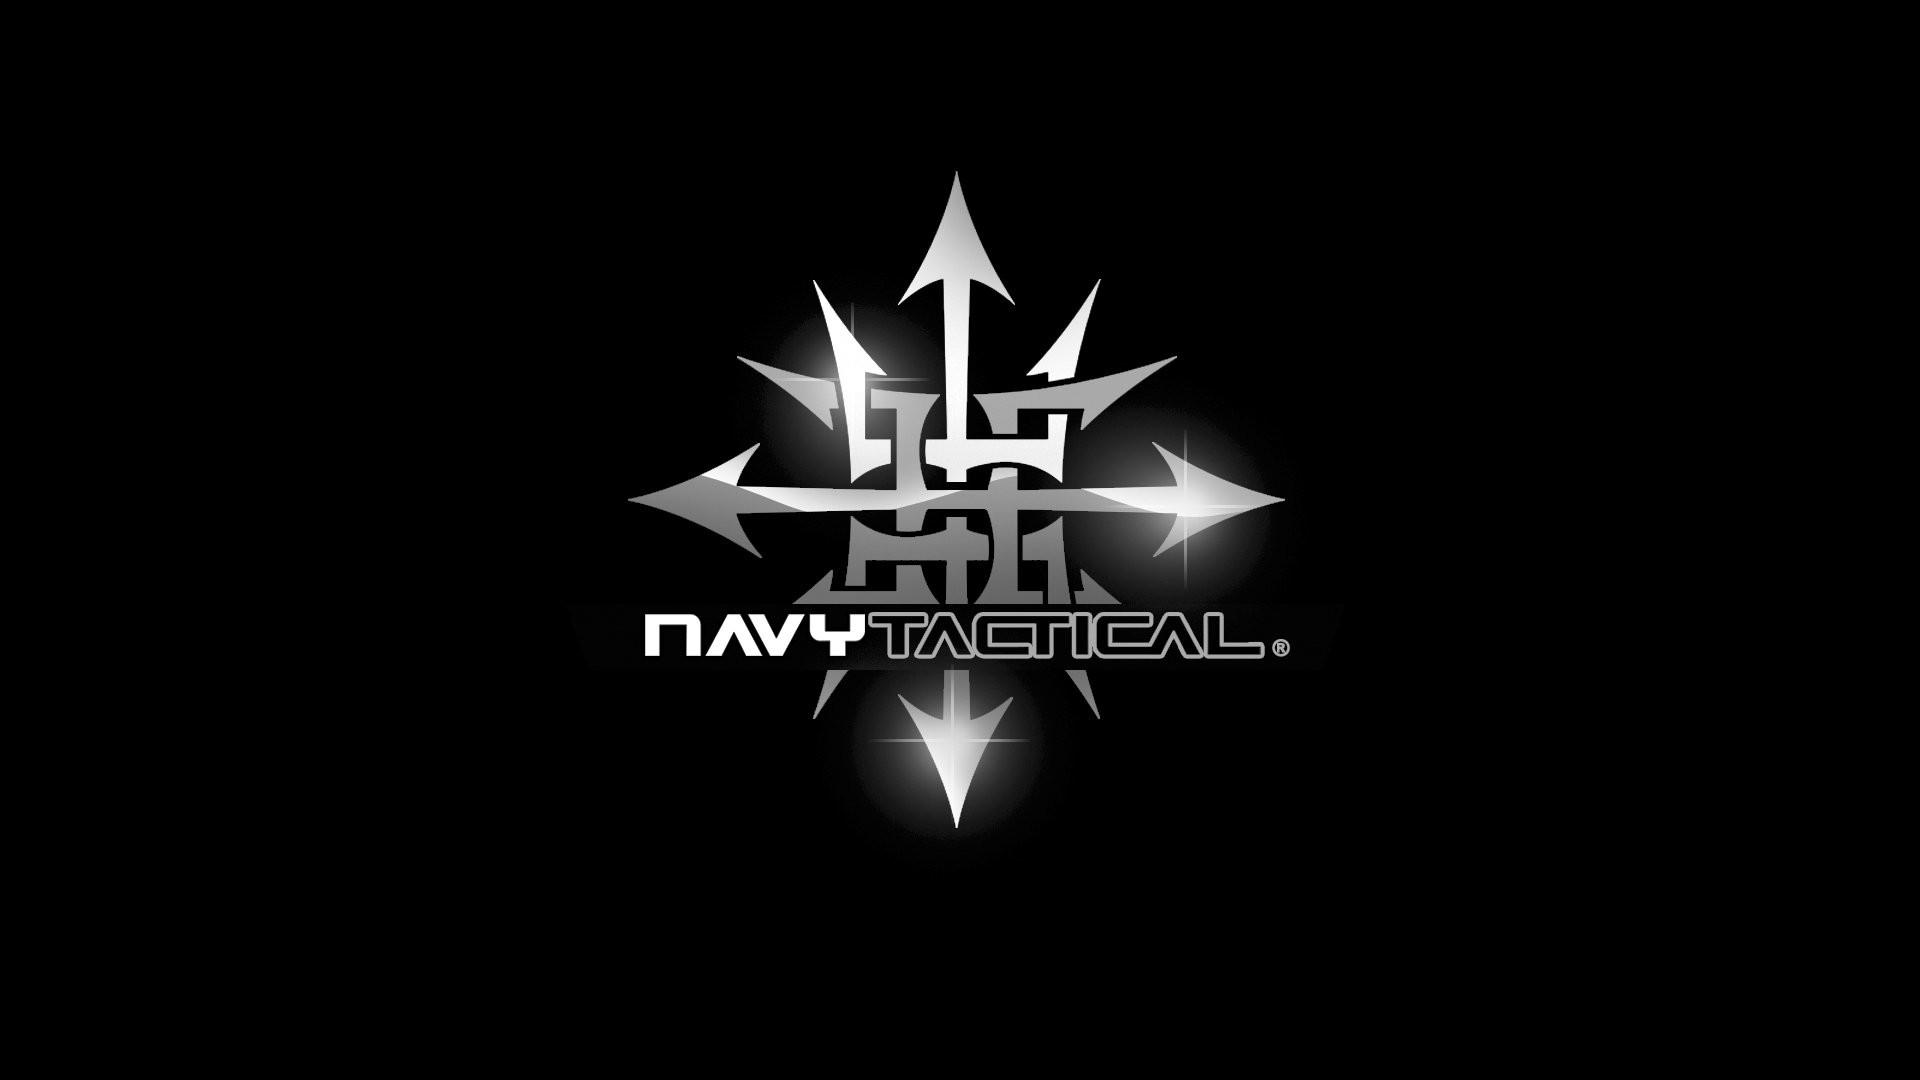 Navy logo military poster (3) wallpaper